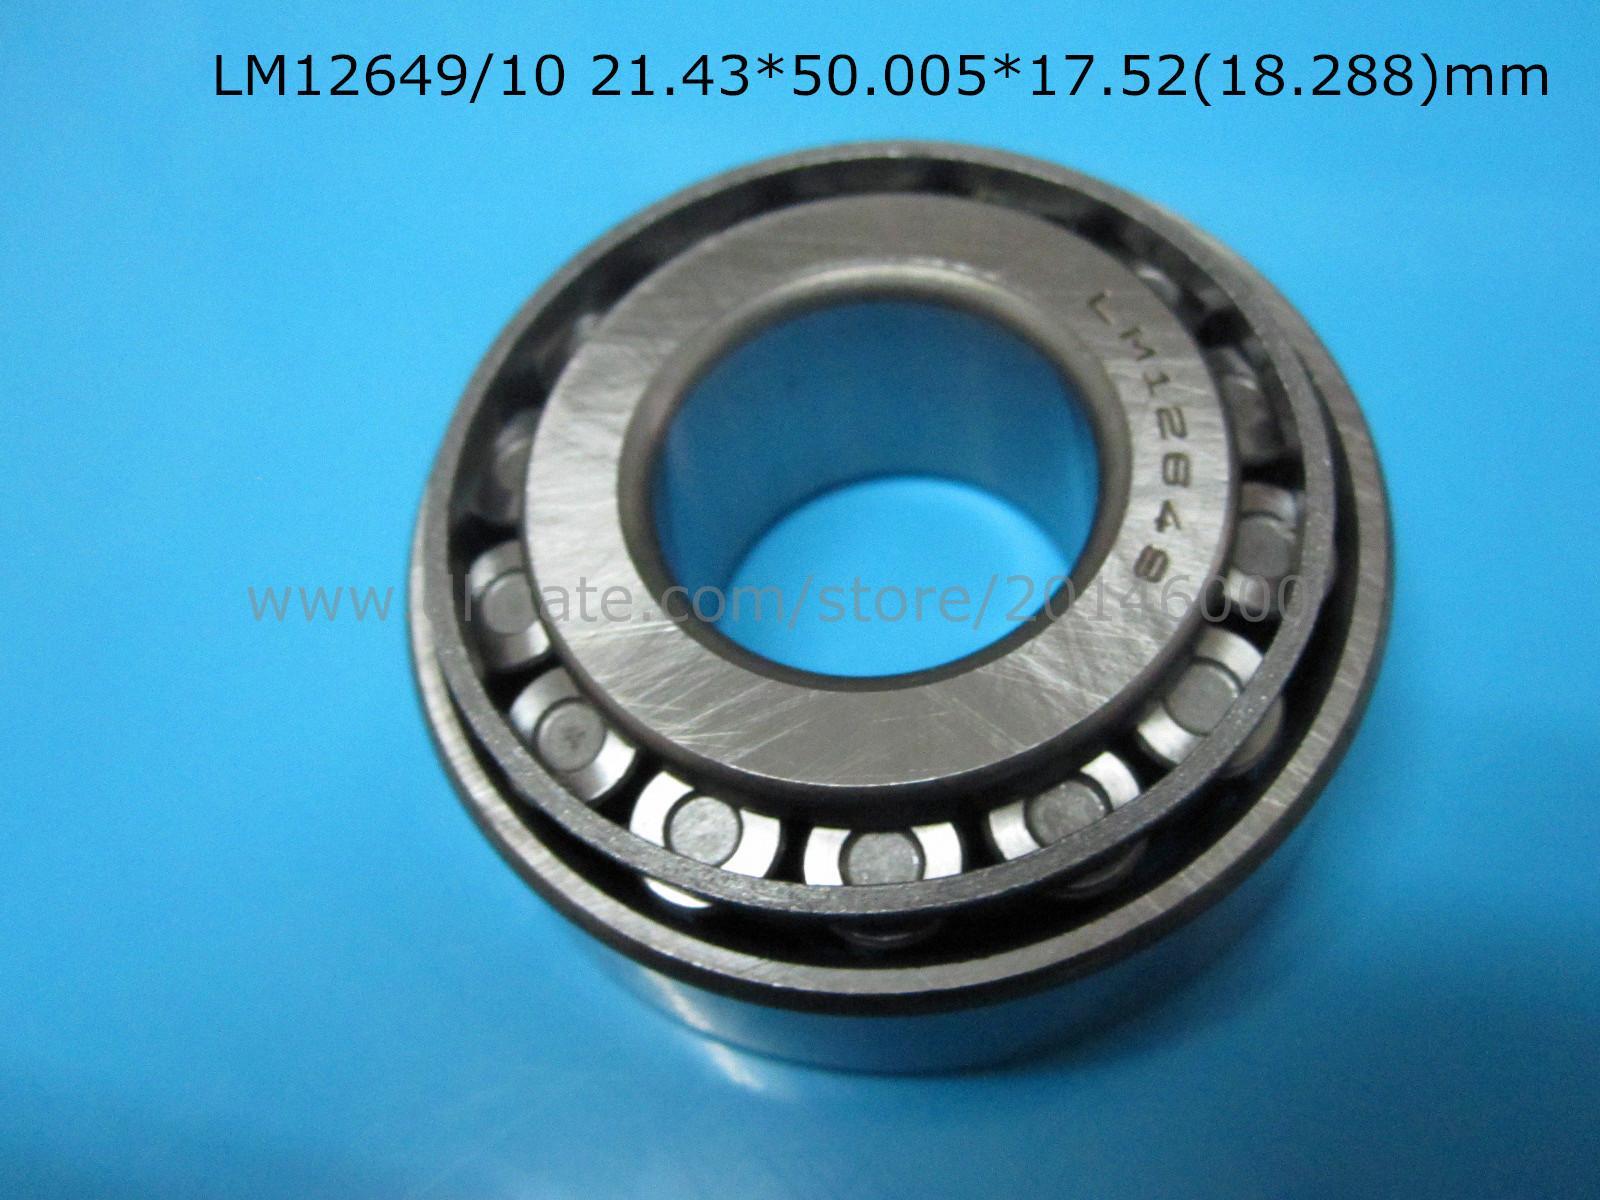 12649 LM12649/10 подшипников сплющенного ролика LM12649/10 21.43*50.005*17.52(18.288)мм